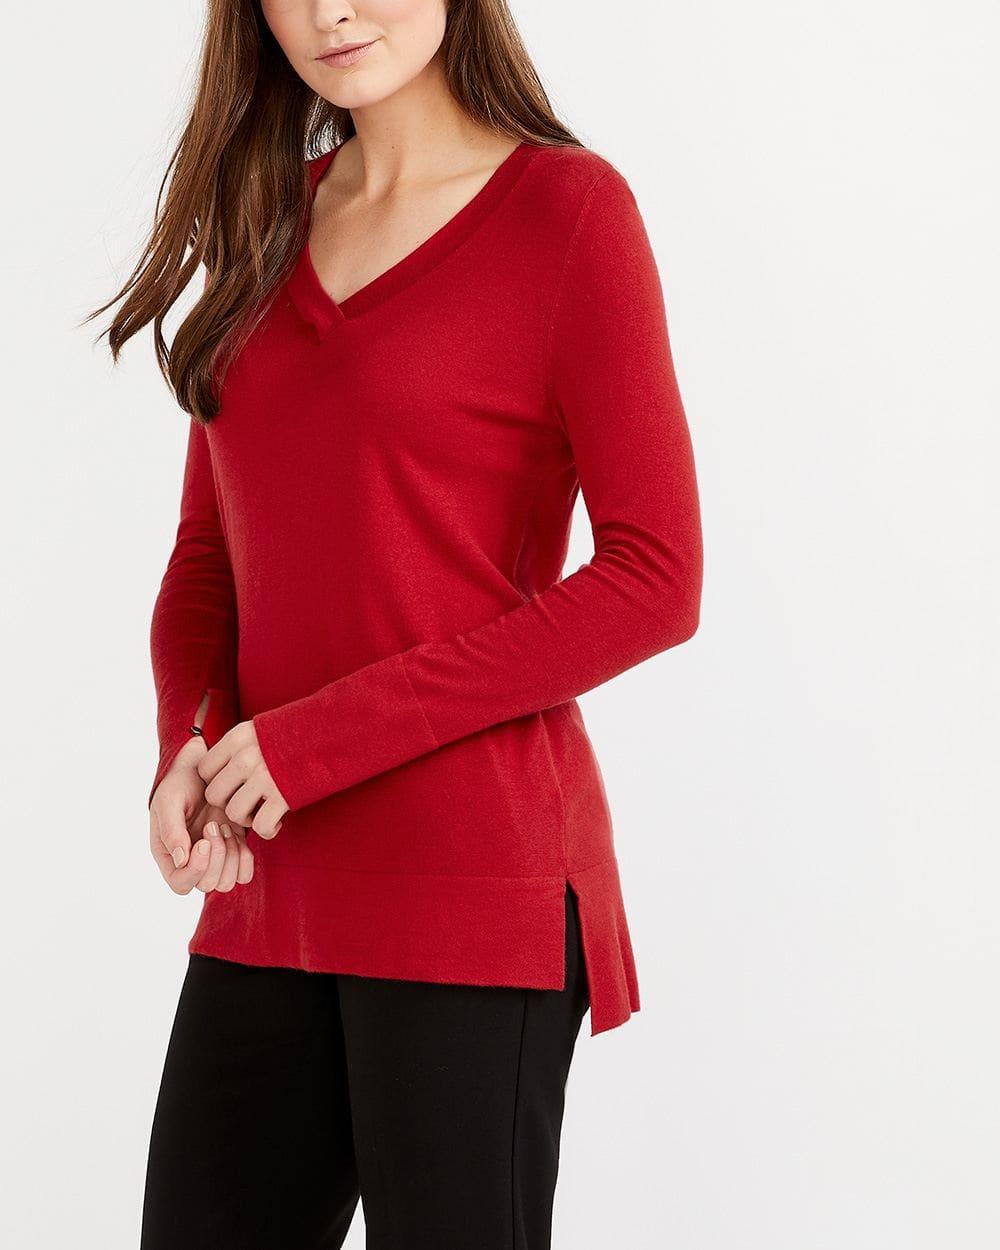 R Essentials Solid V-Neck Sweater